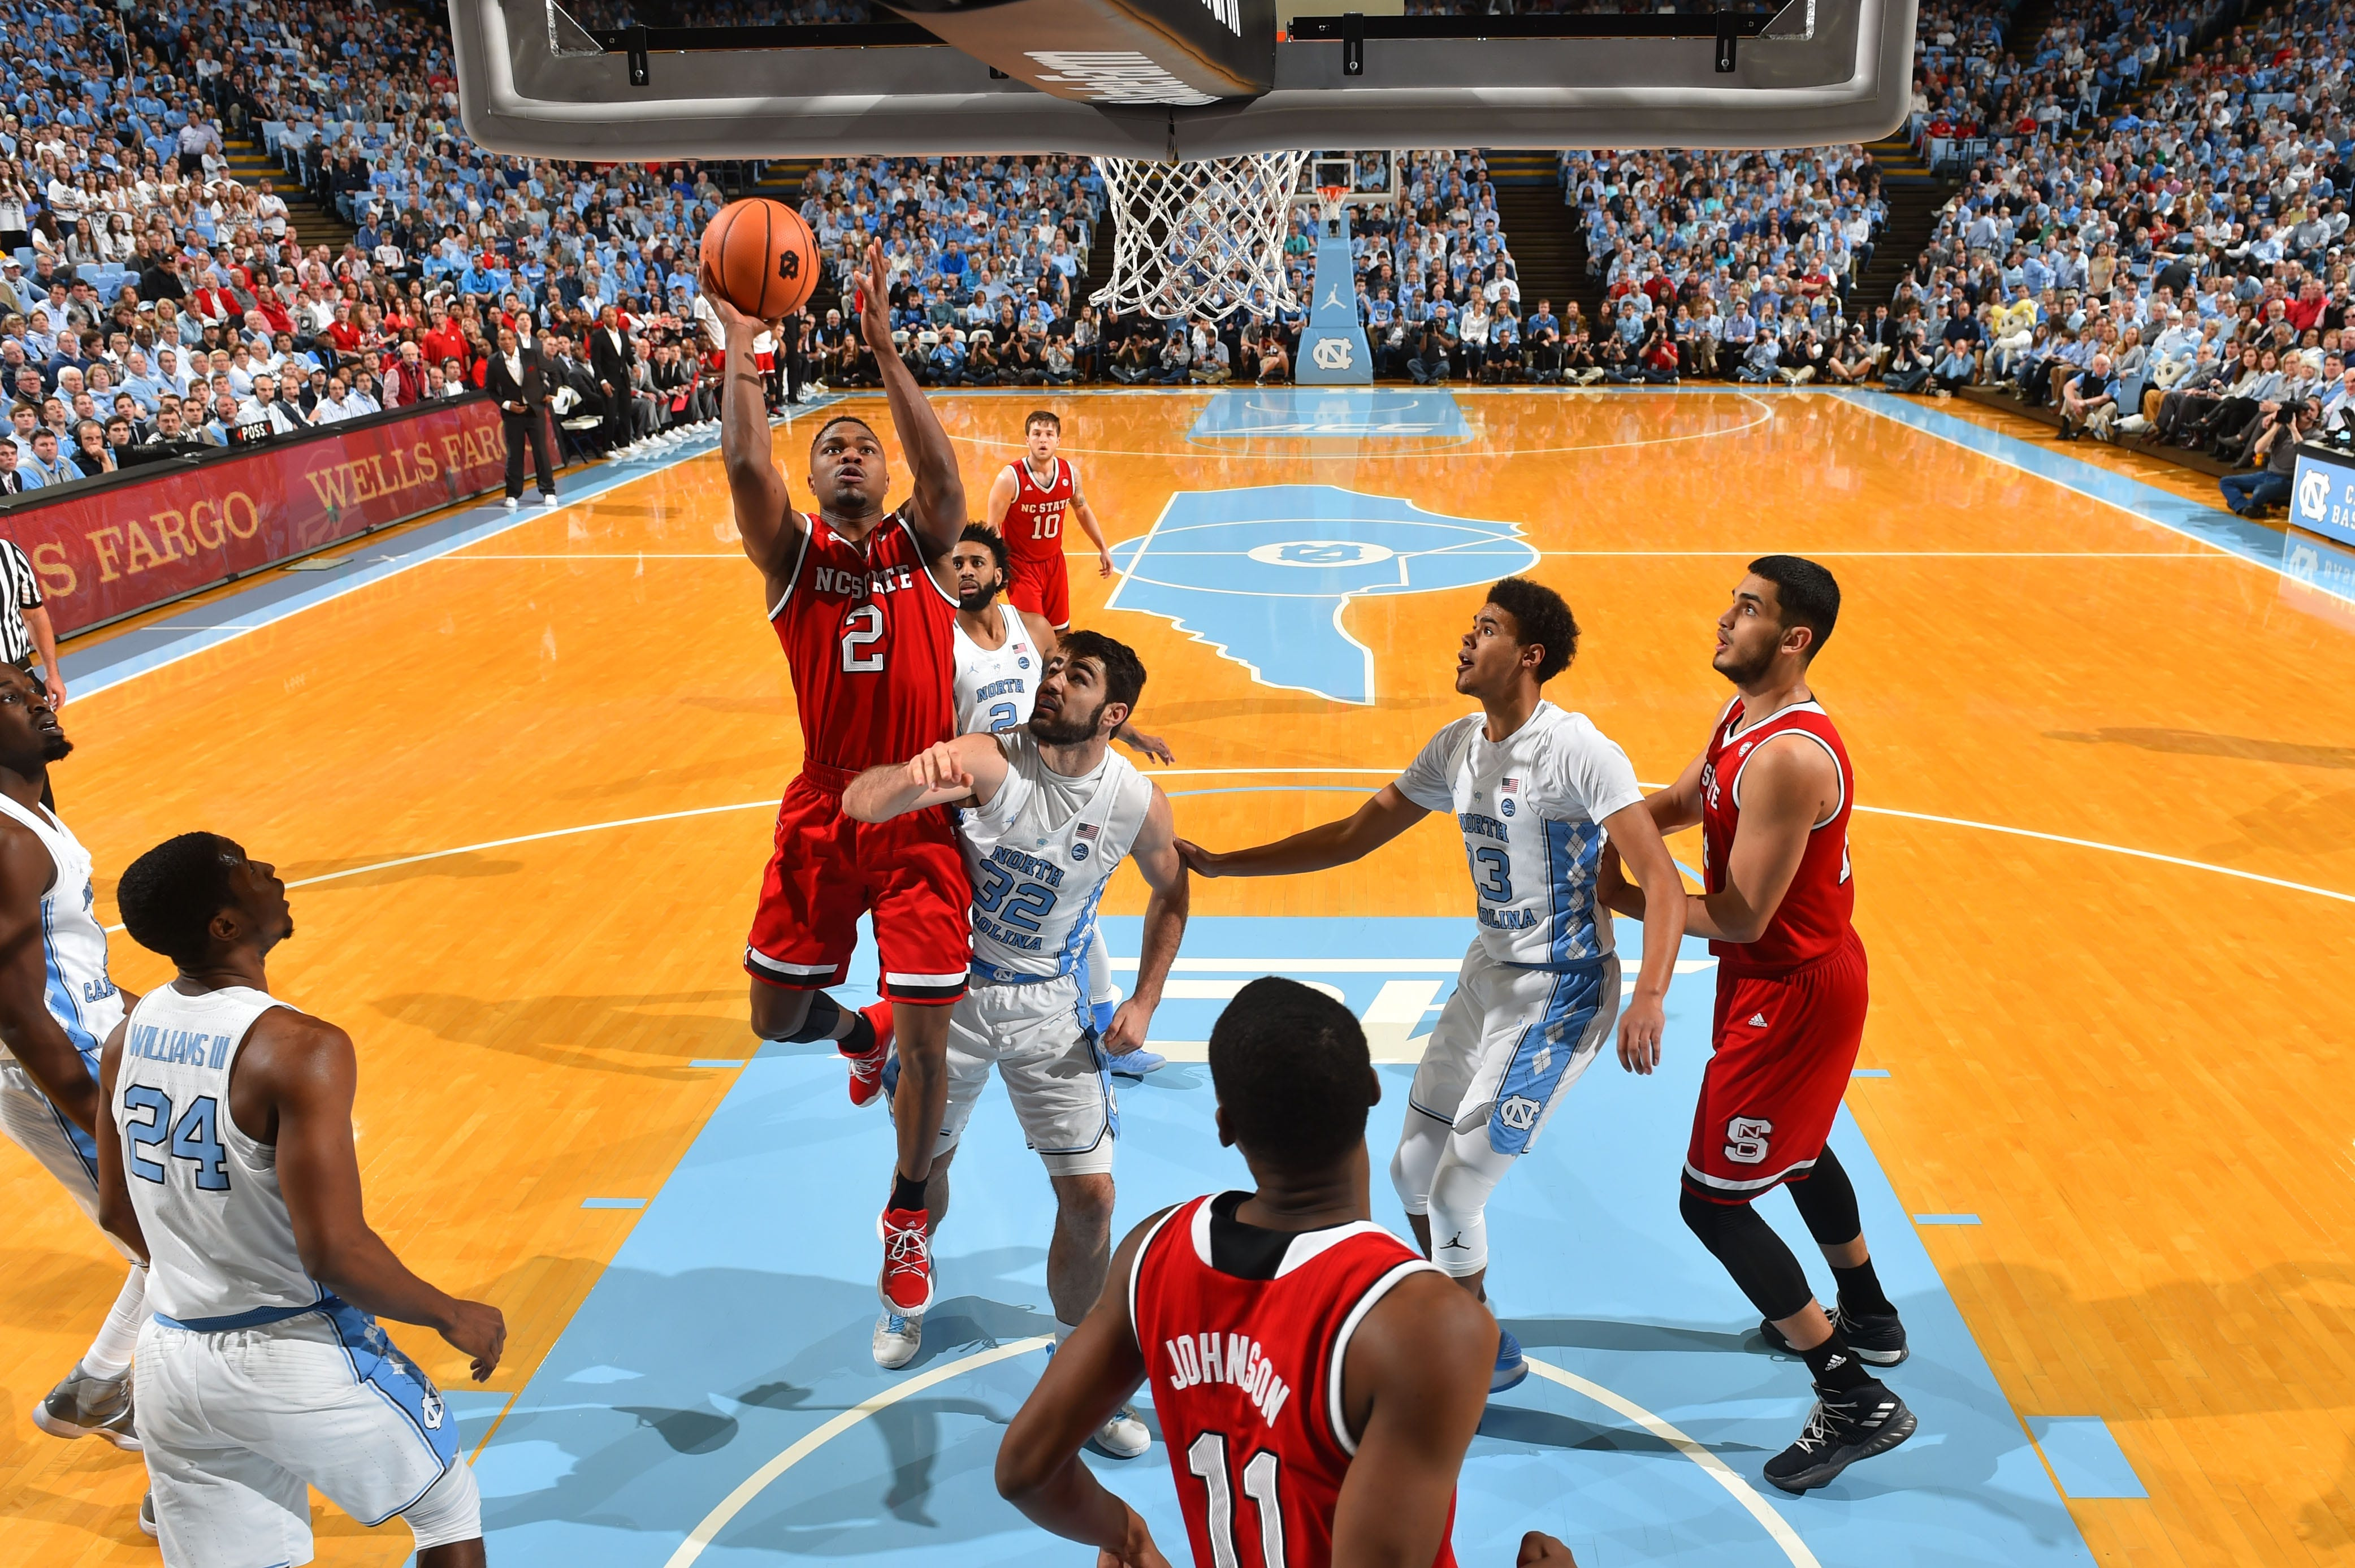 North Carolina State takes down No. 10 North Carolina in overtime